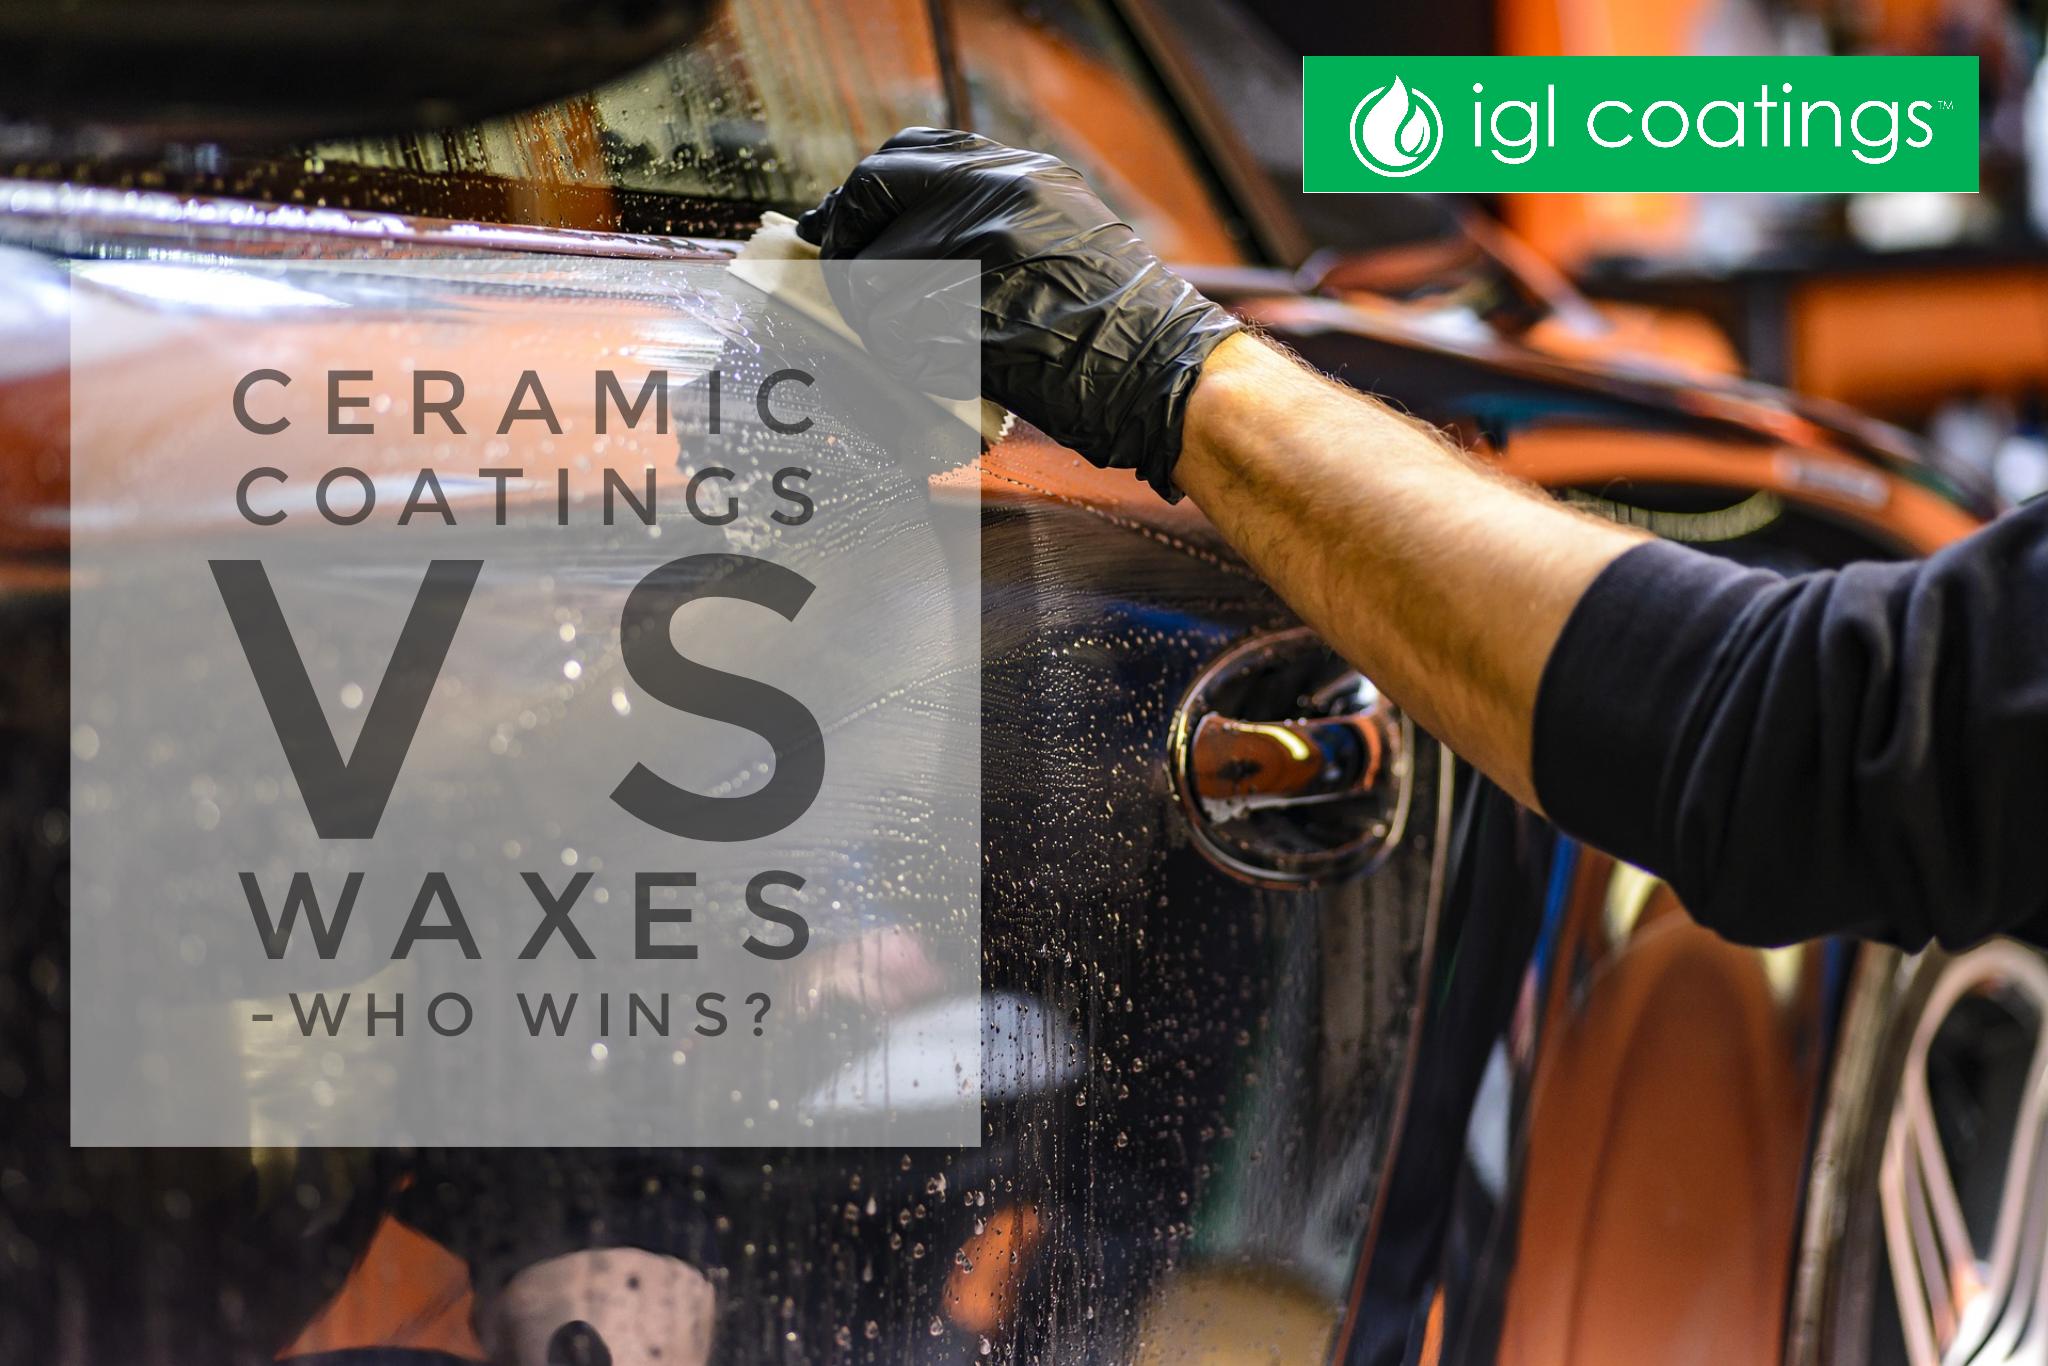 Waxes vs ceramic coatings